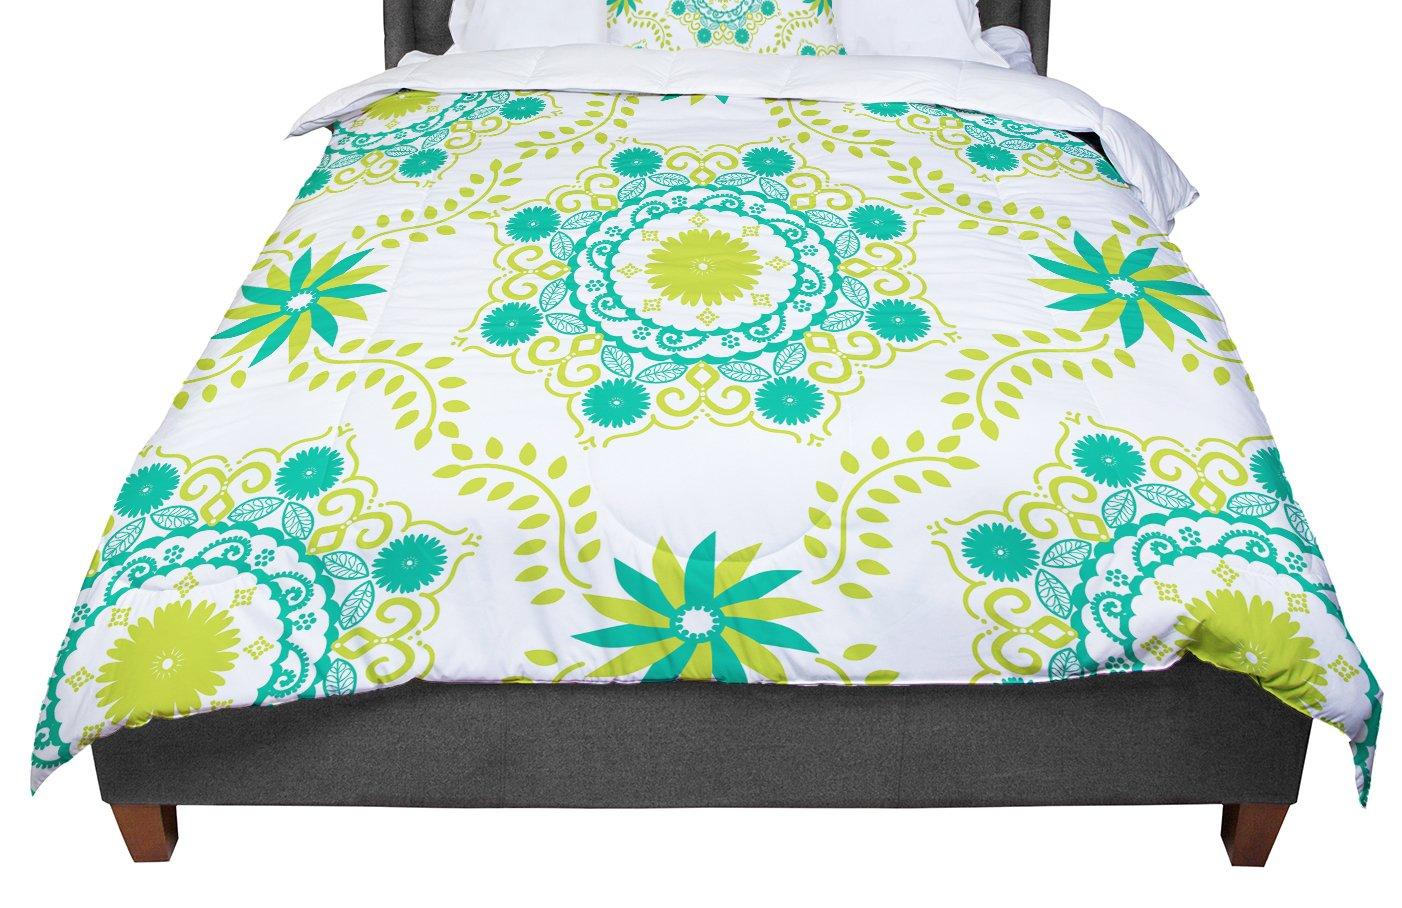 KESS InHouse Anneline Sophia ''Let's Dance Green'' Teal Floral Queen Comforter, 88'' X 88''